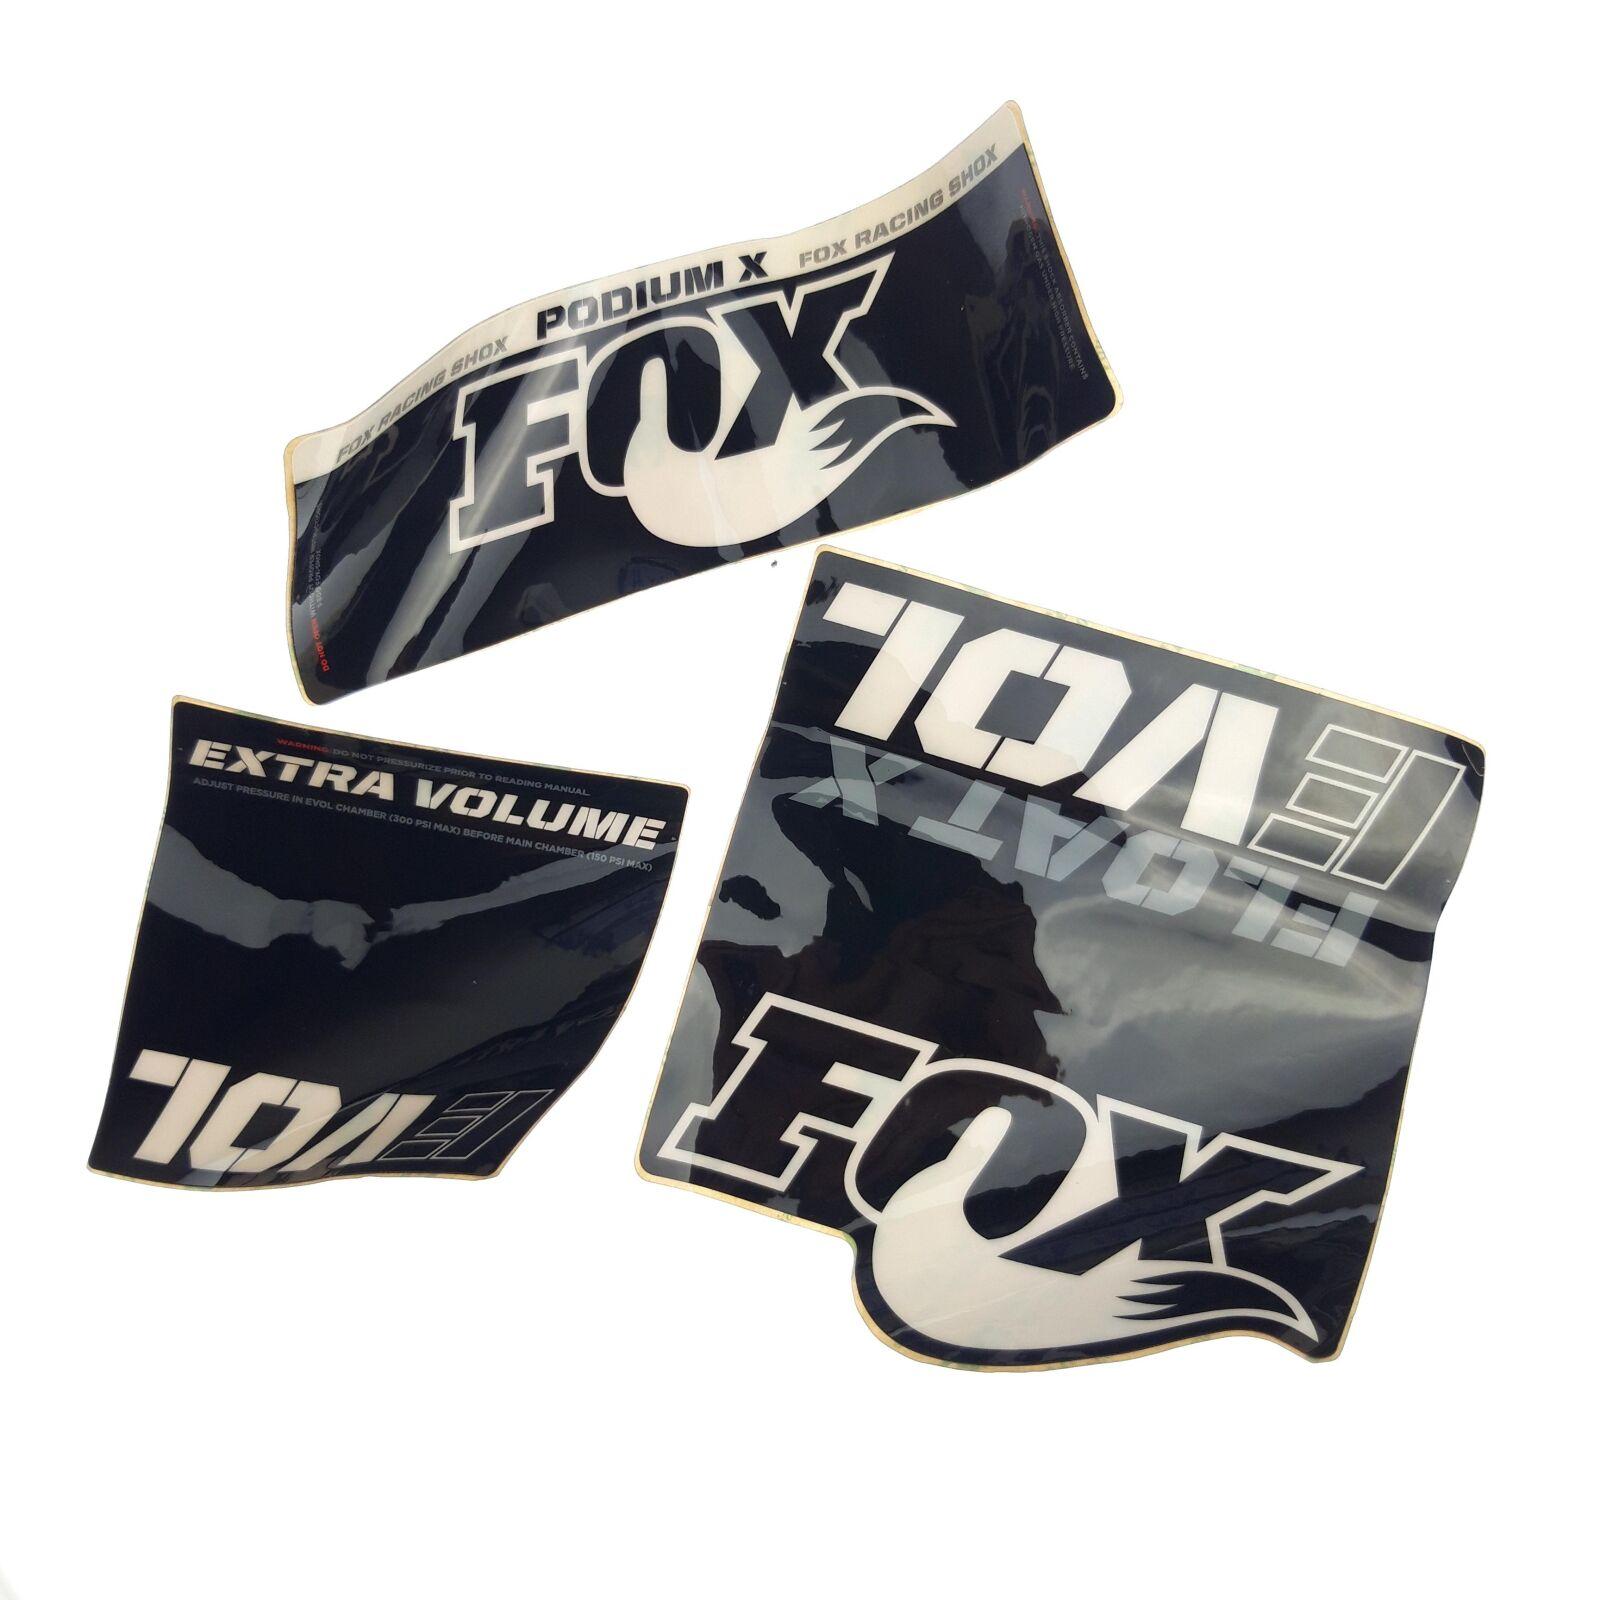 Decal Kit: Float X Evol & Podium-X Gen II (Short Air Sleeve)